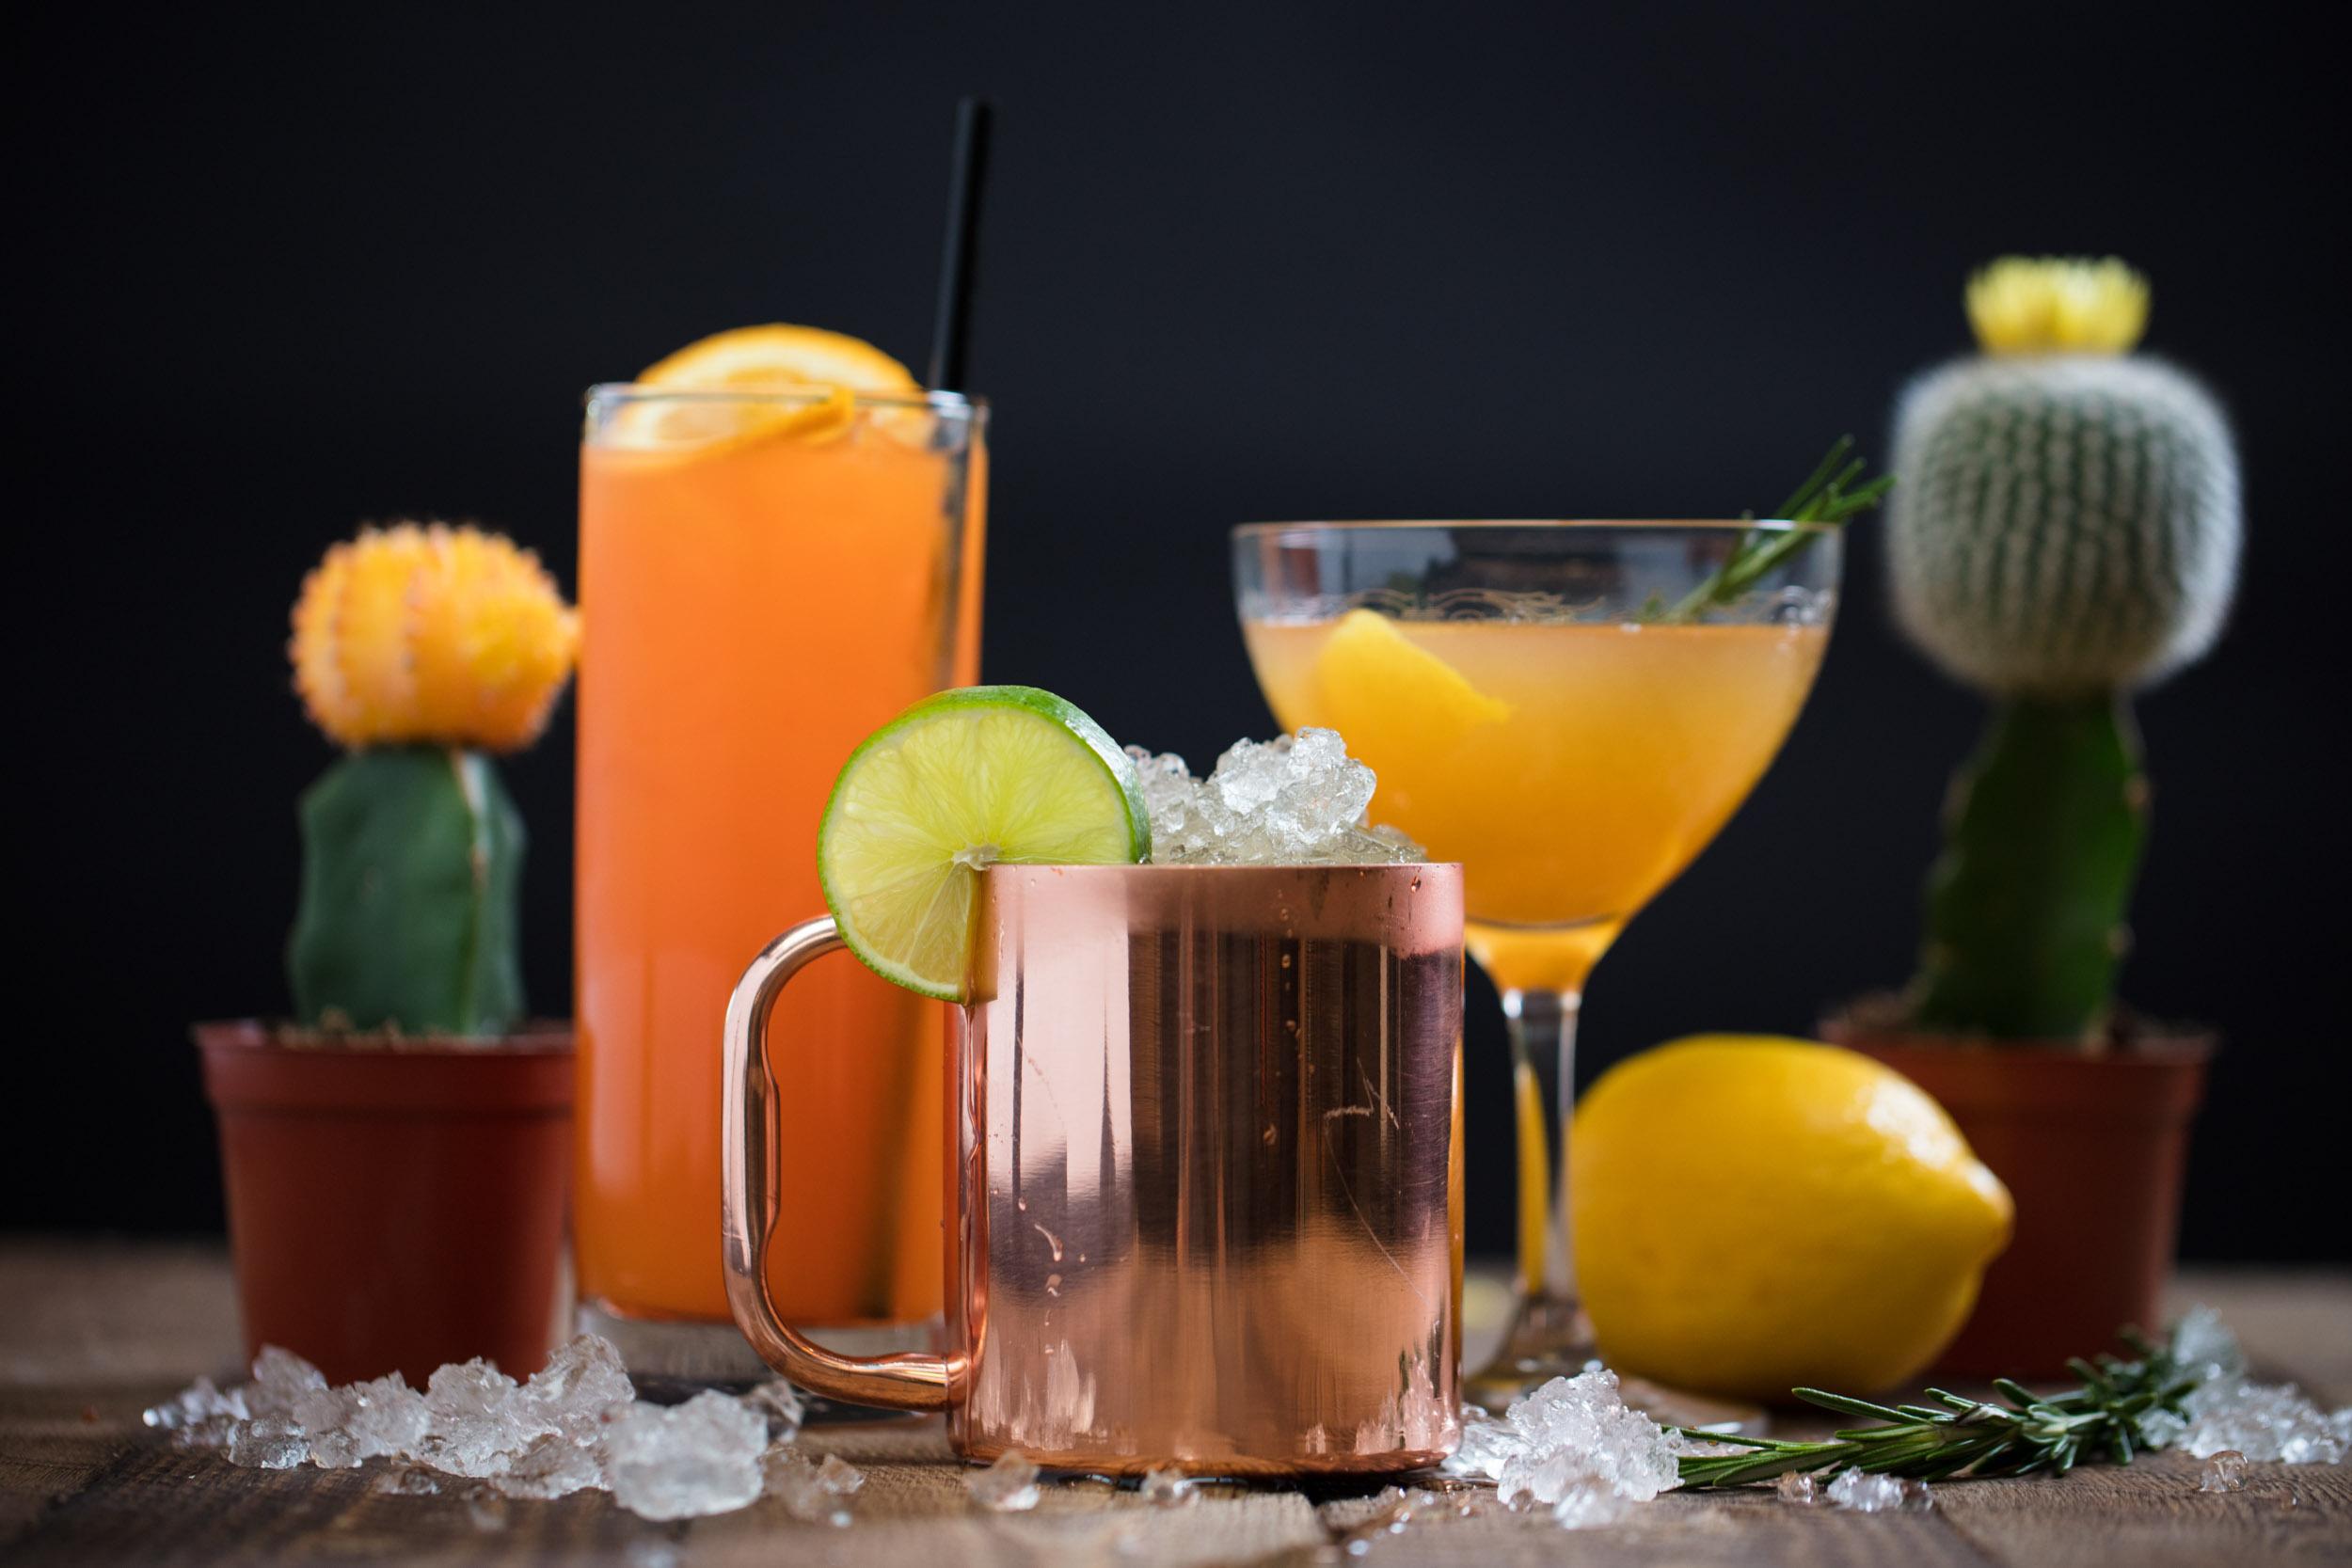 Drinks - Hours